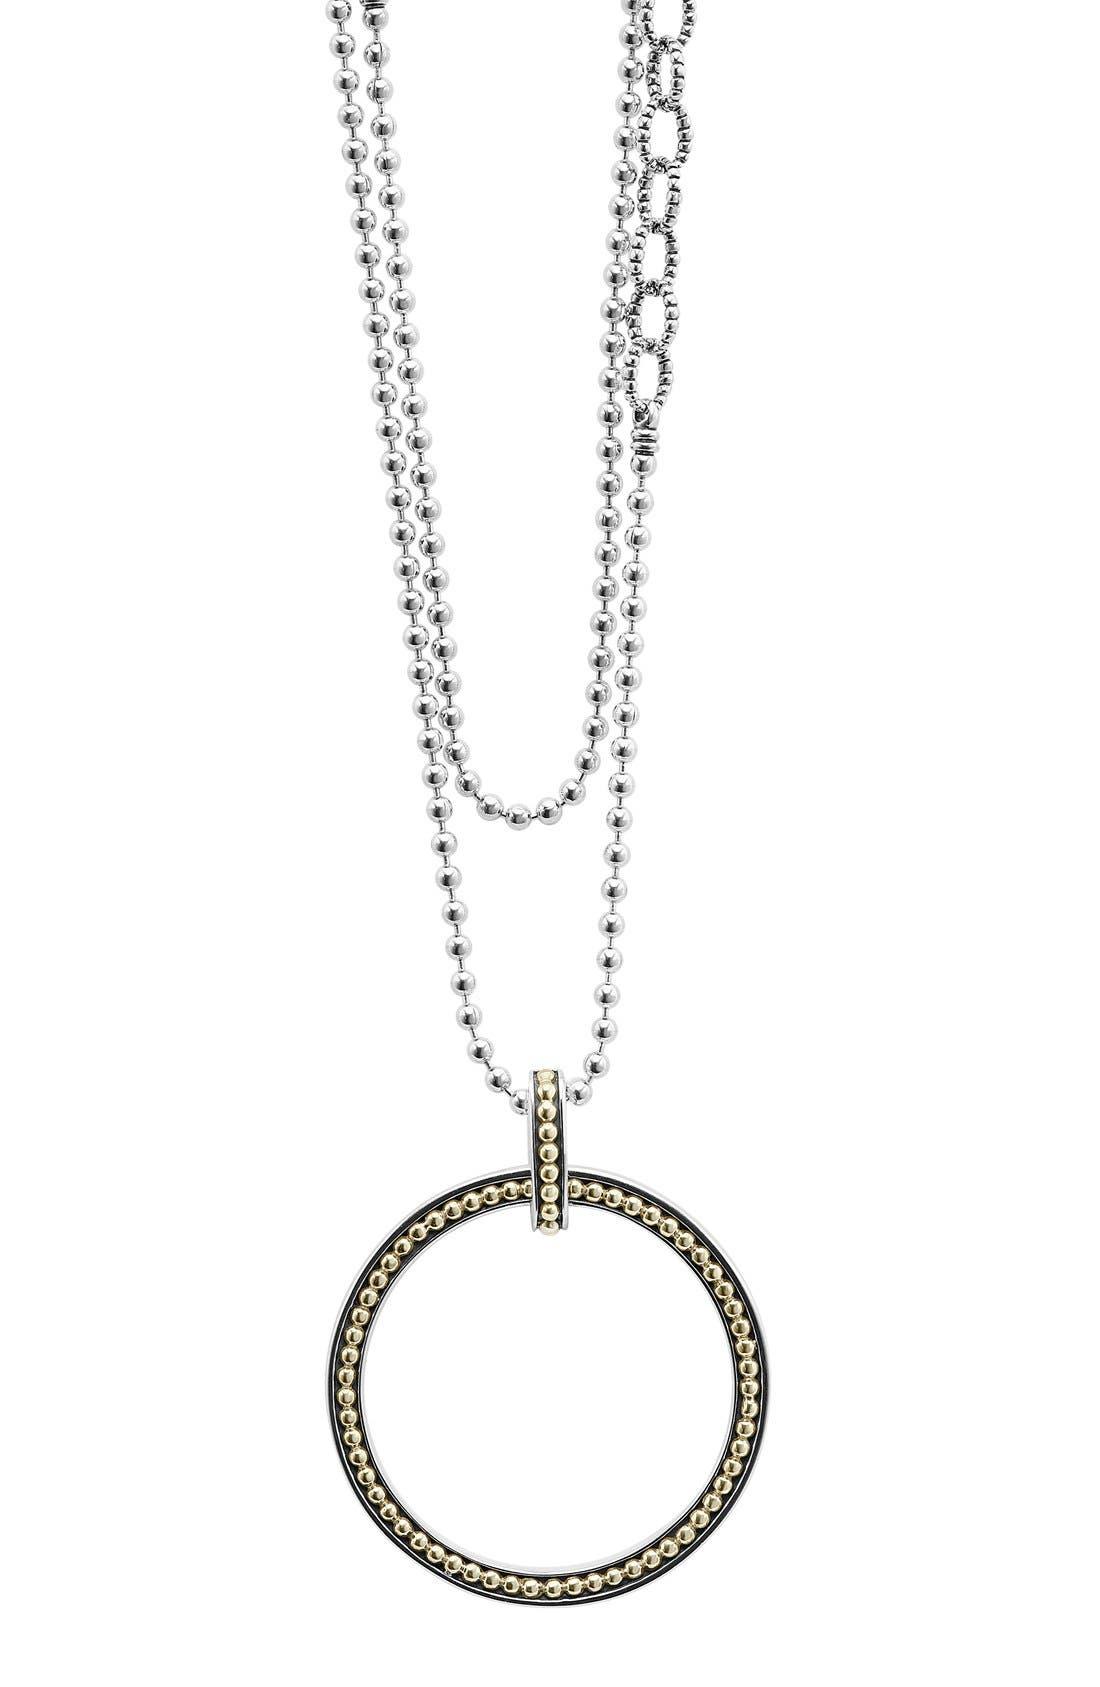 Enso Long Pendant Necklace,                             Main thumbnail 1, color,                             SILVER/ GOLD